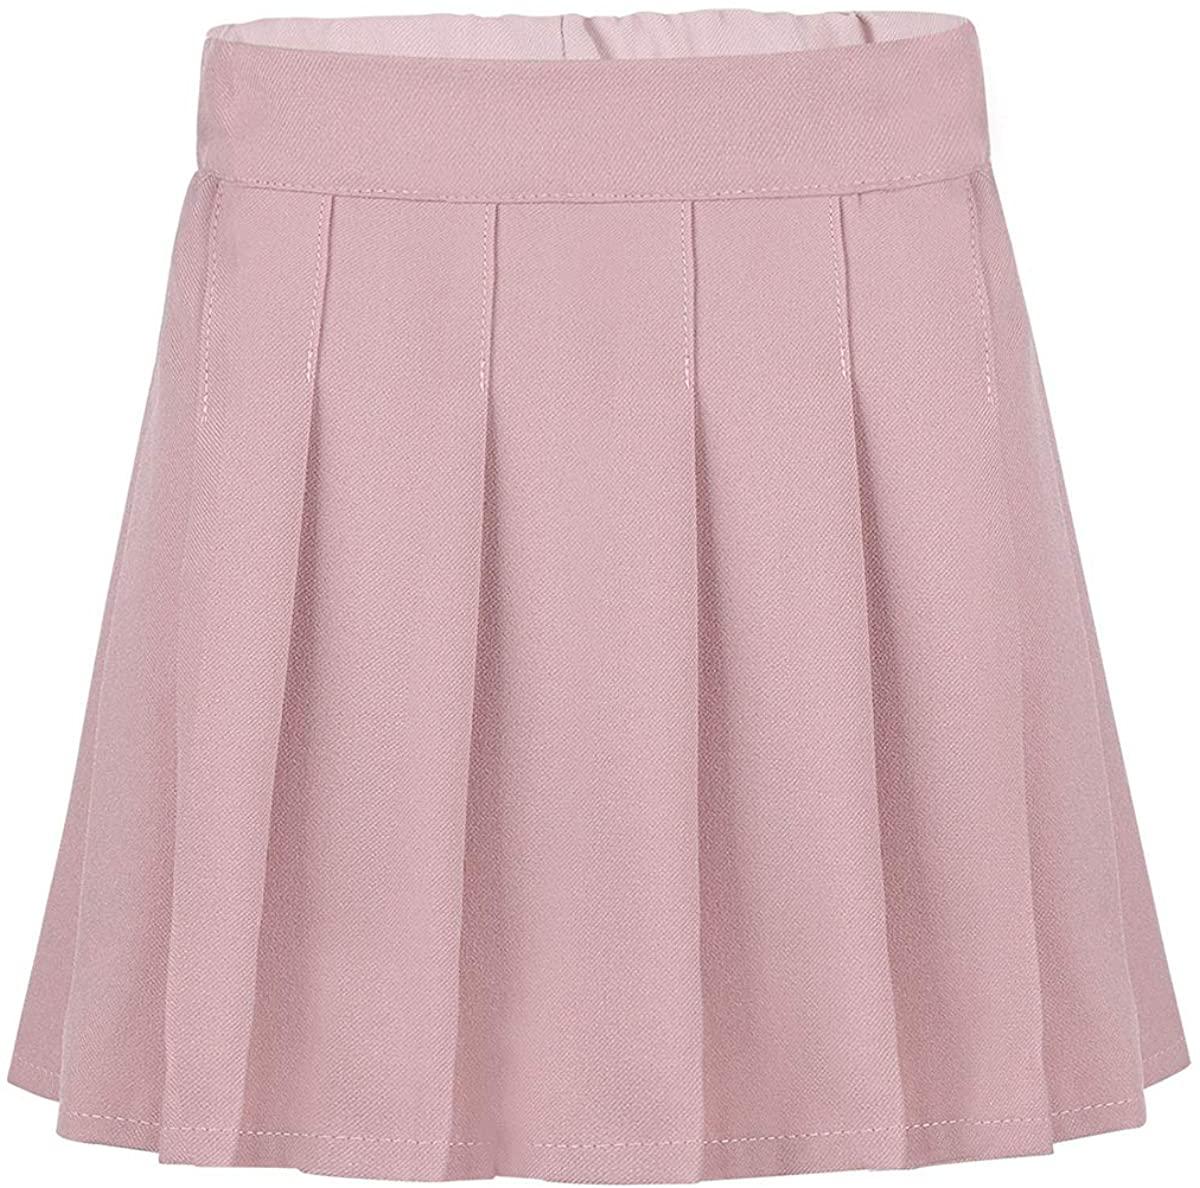 iiniim Kids Girls Classic School Uniform Skirt Schoolgirl Pleated Scooters Skort Mini Skirt with Hidden Shorts